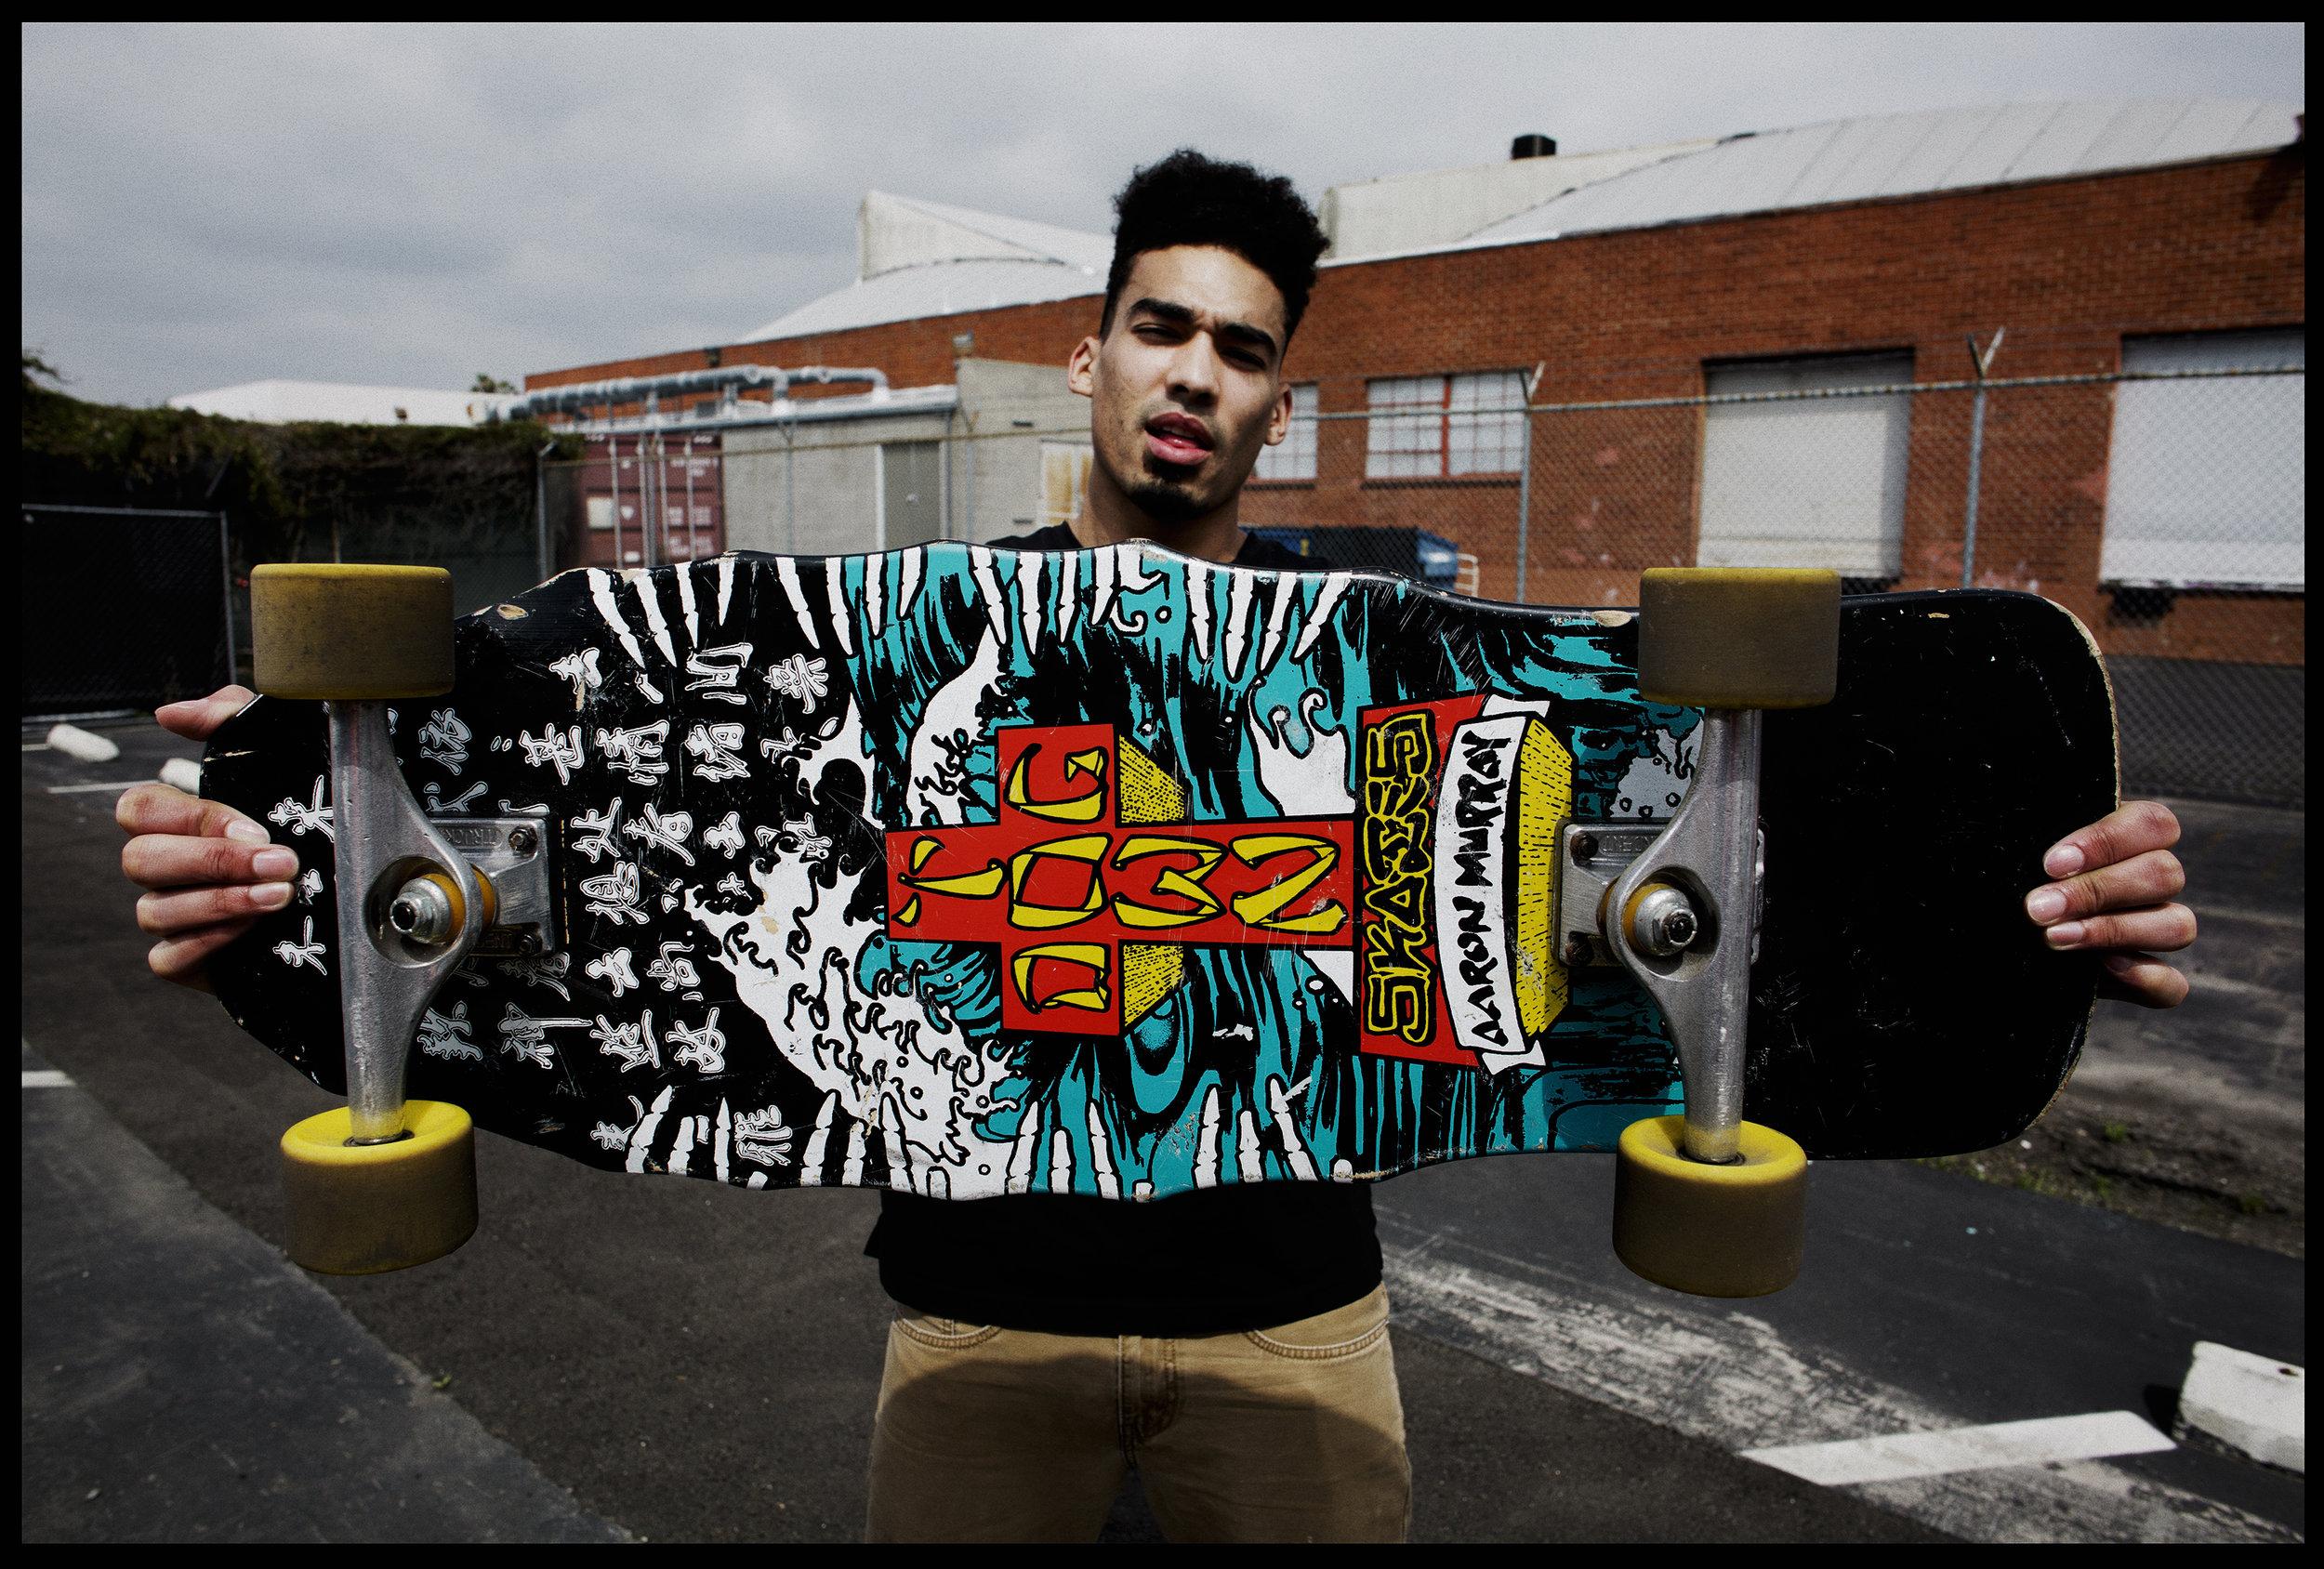 Roman_Dogtown_Skate_Portrait_01.jpg